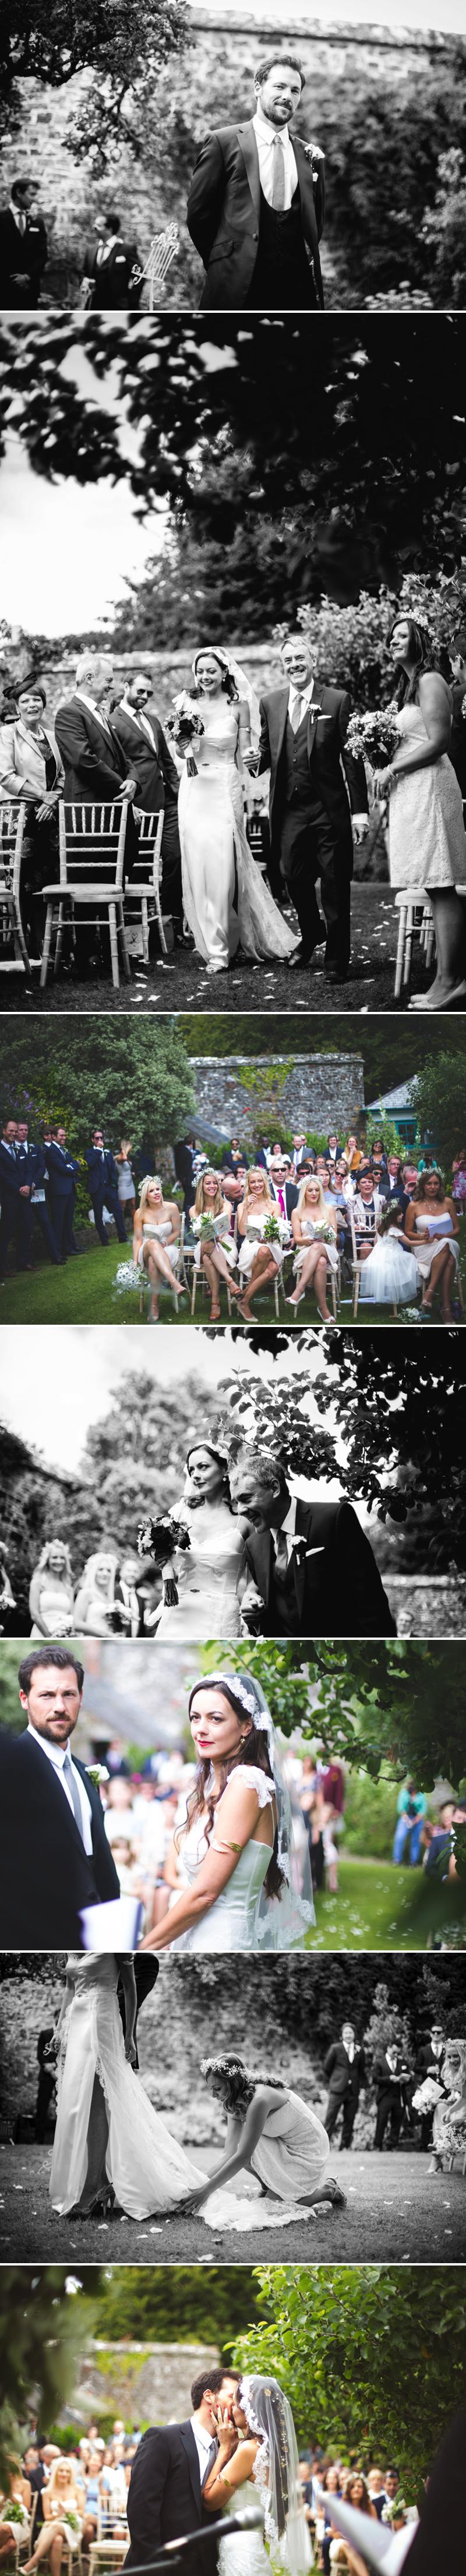 wedding-venues-in-devon-clovelly-village-weddings-002